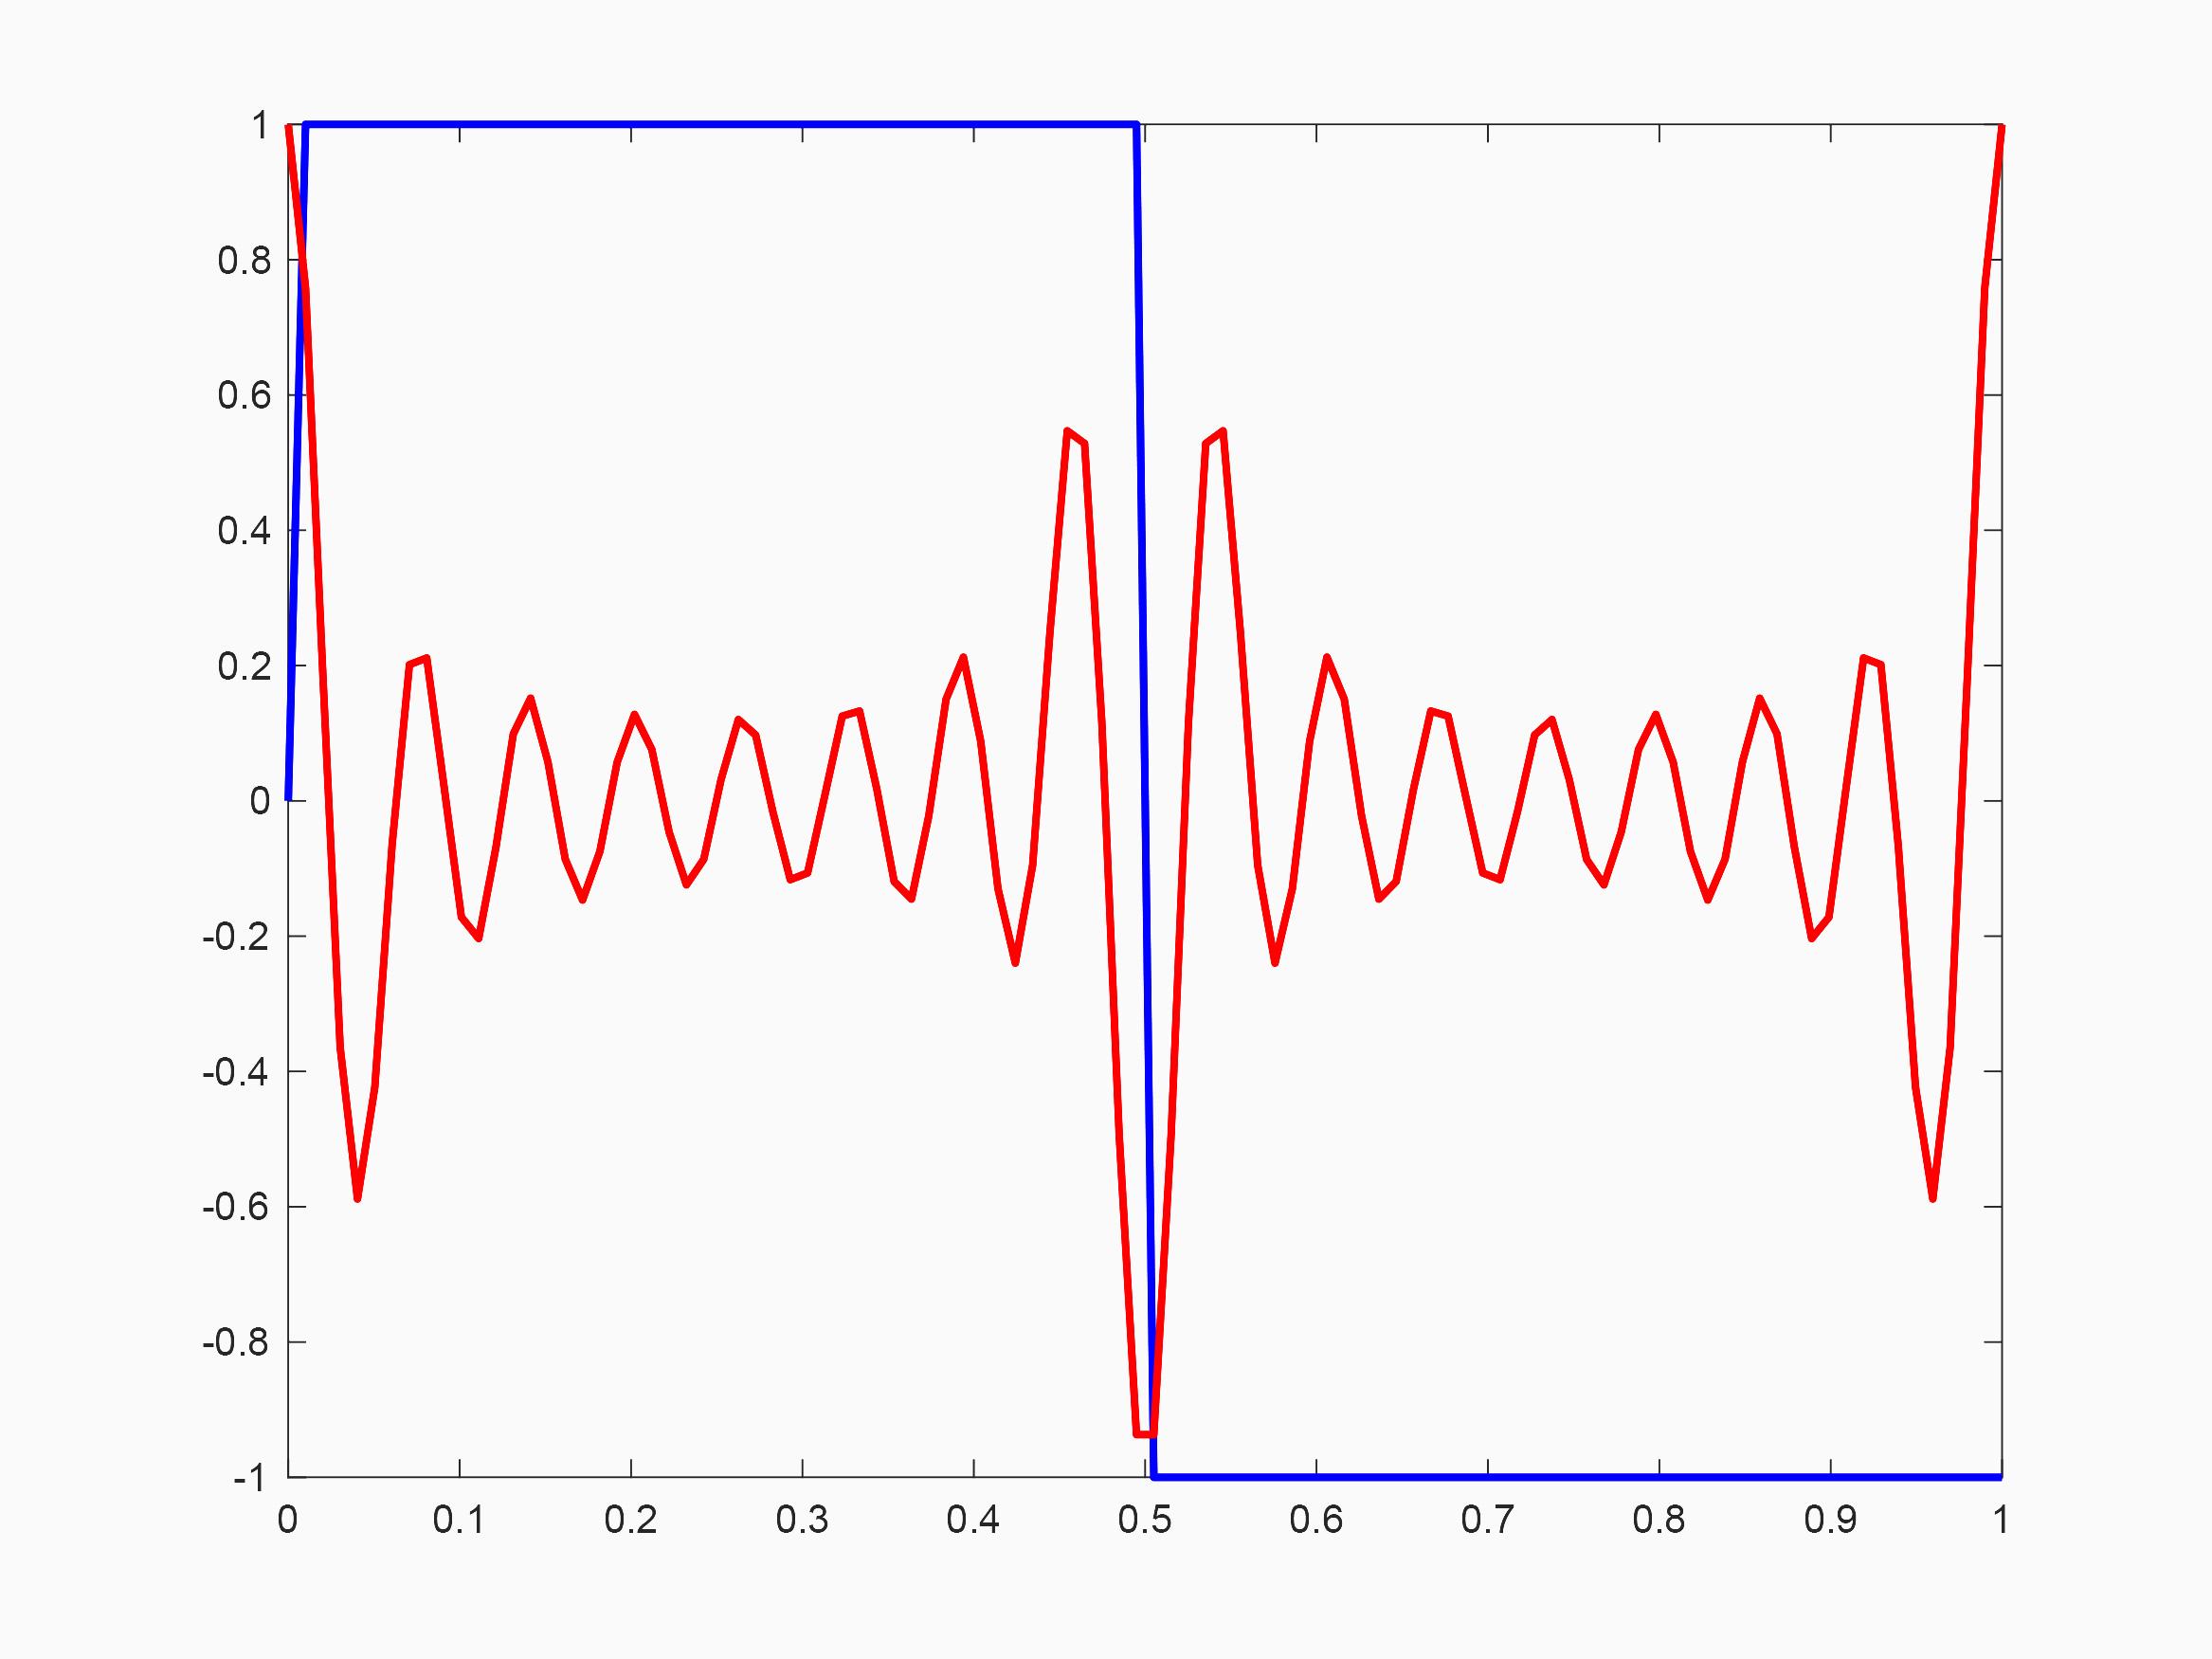 Figure 1: MatLab plot of example waveforms